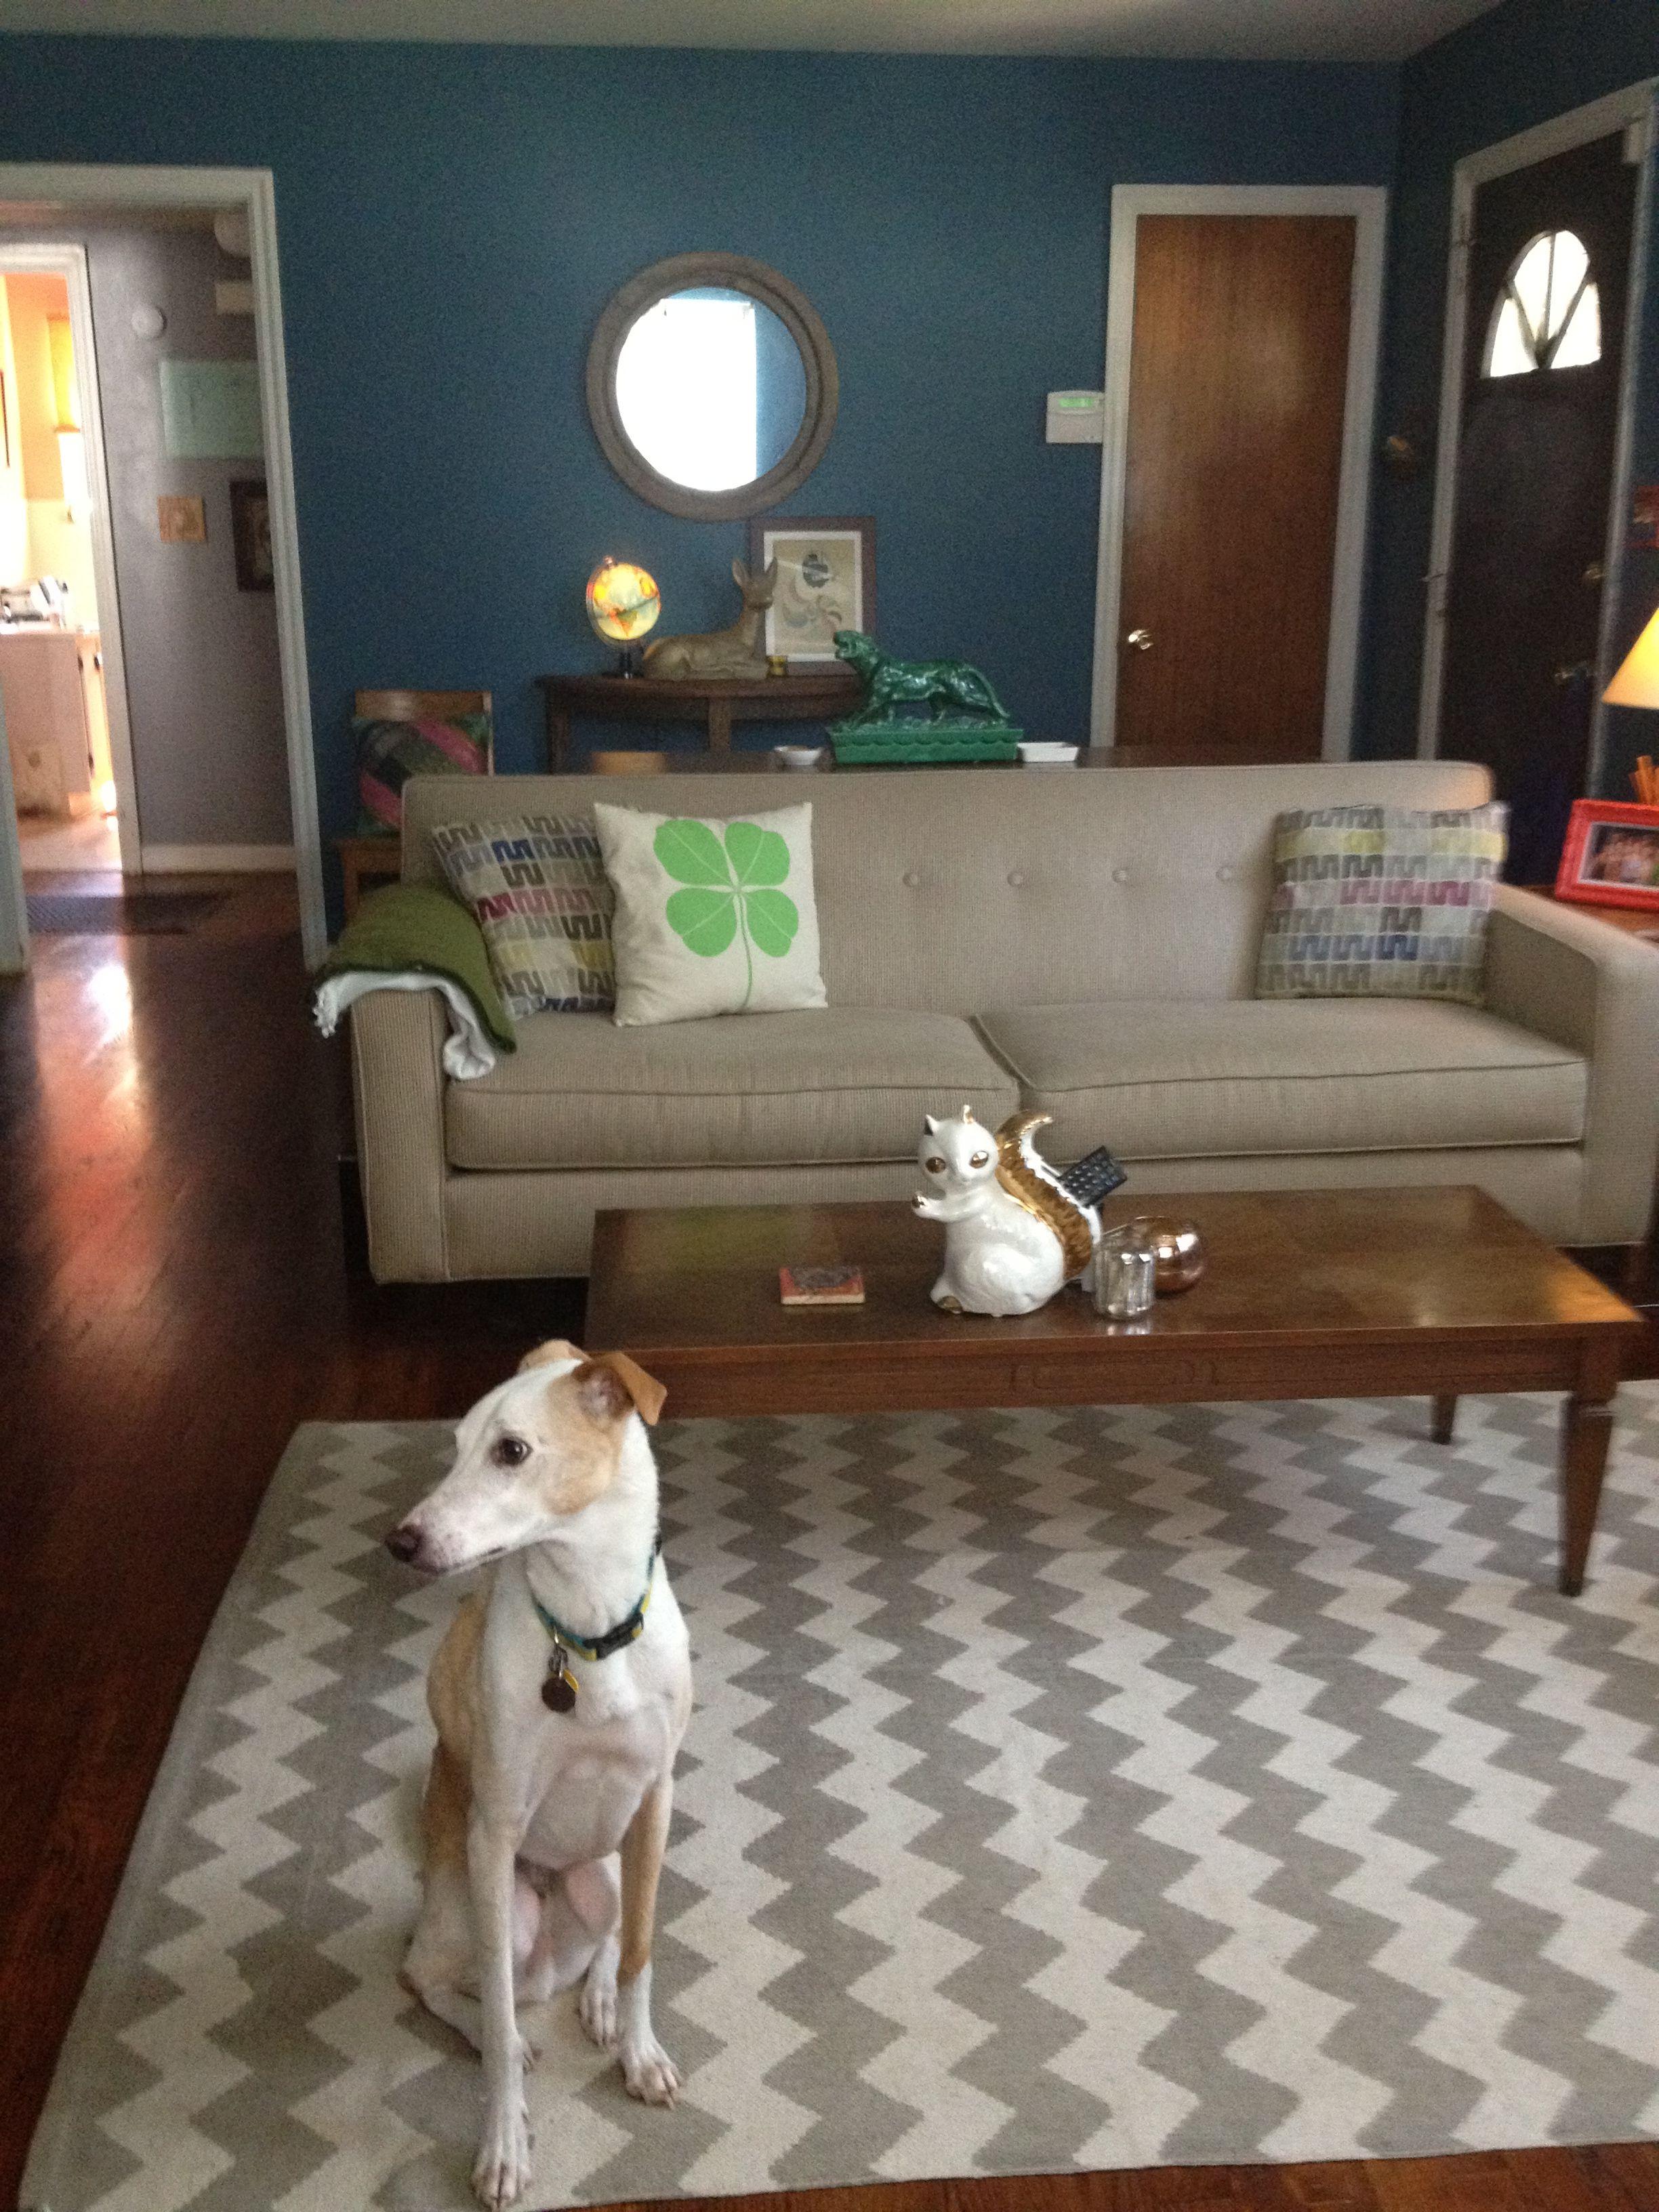 sofa. rug. back table. mirror.